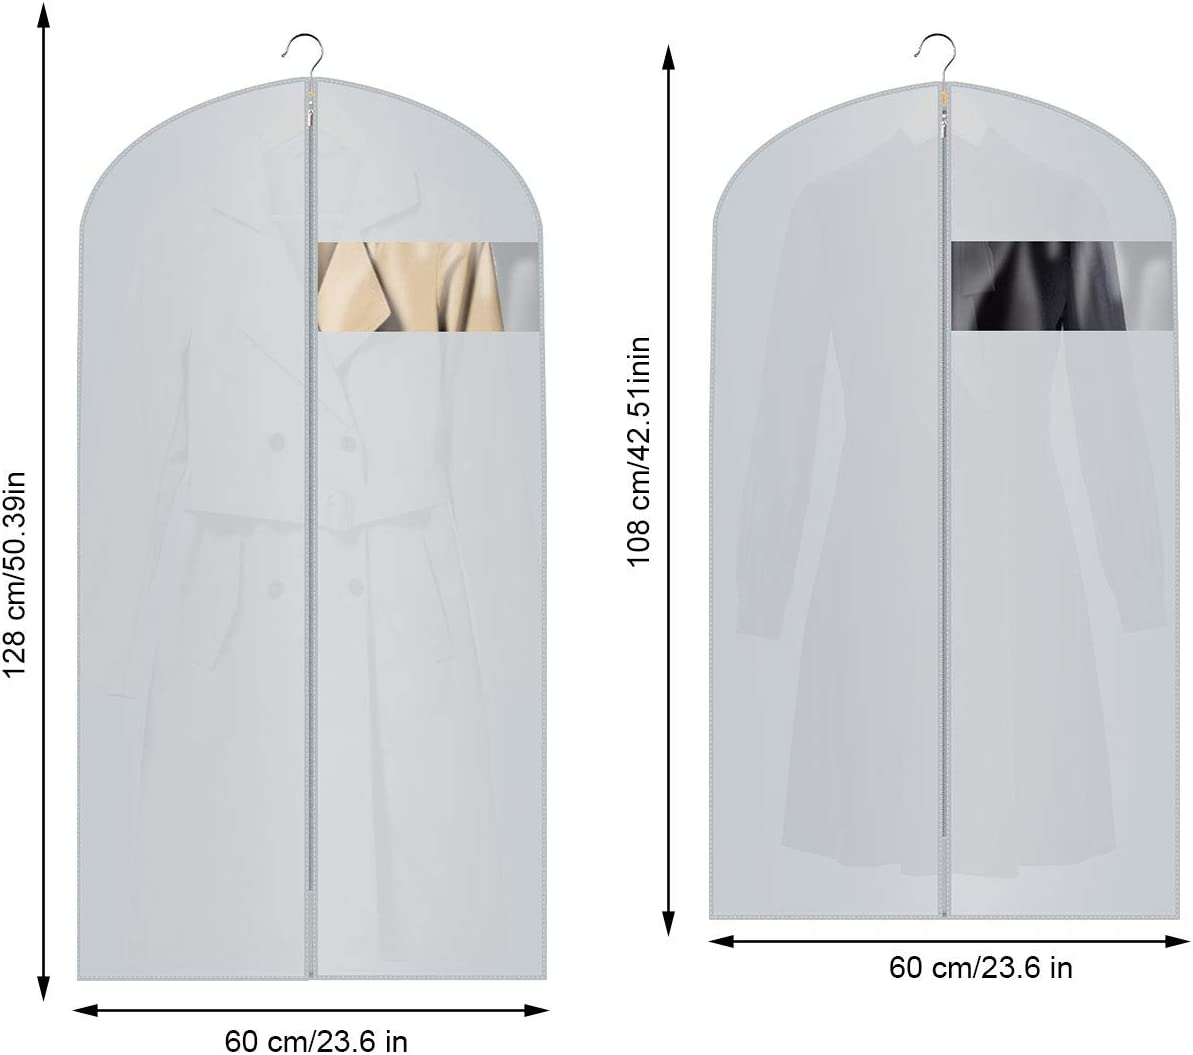 Fundas de Ropa,6Pcs Bolsas De Ropa Transparentes Impermeables Transpirables con Cremalleras,Vestido de Noche Vestido de Novia Abrigos Camisas Polilla Protecci/ón Repelente al Agua